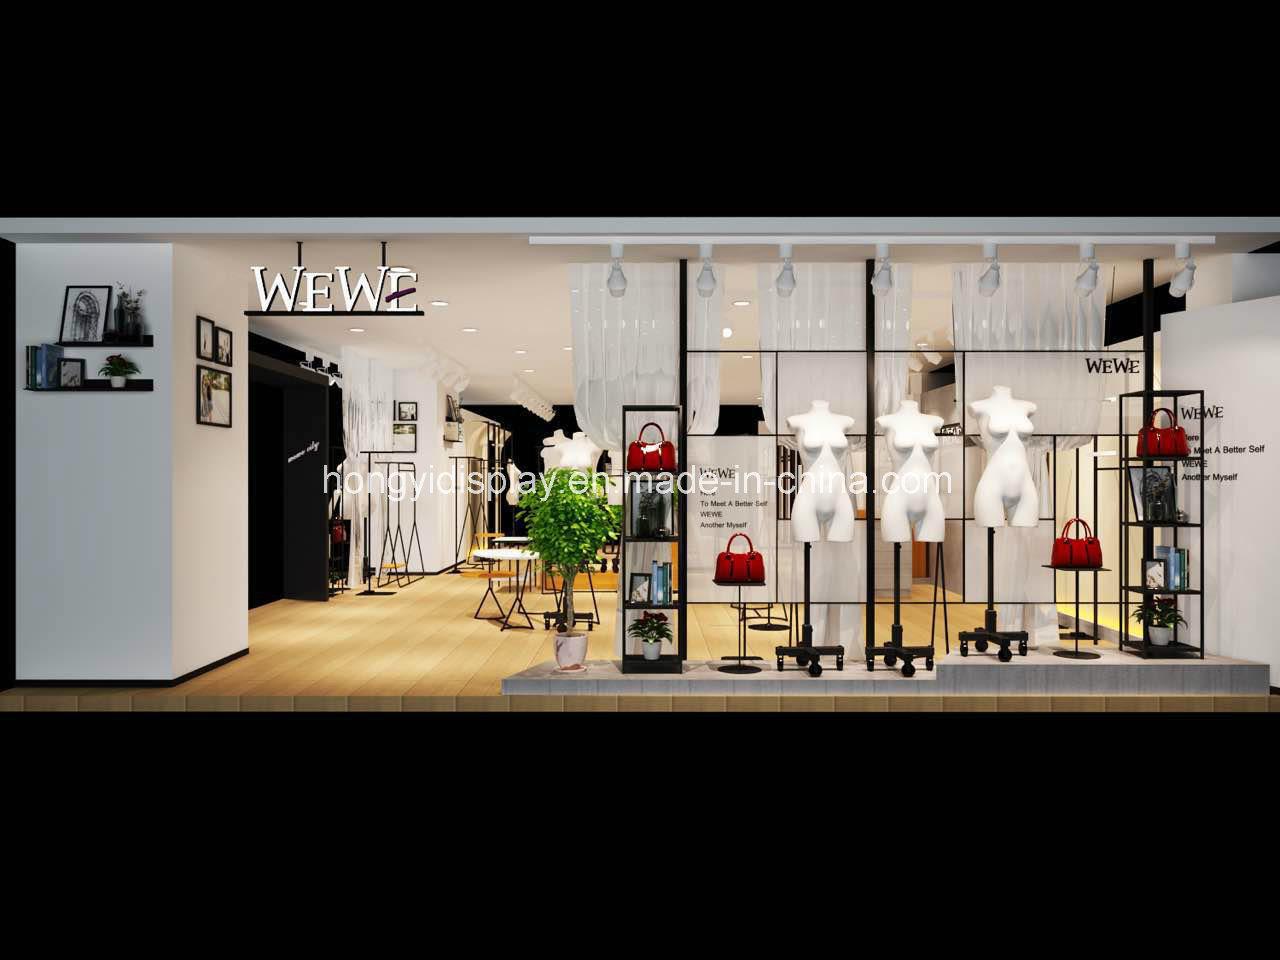 c6771ad4b9d China Ladies Garment Shop Interior Decoration, Display Shelf Photos ...